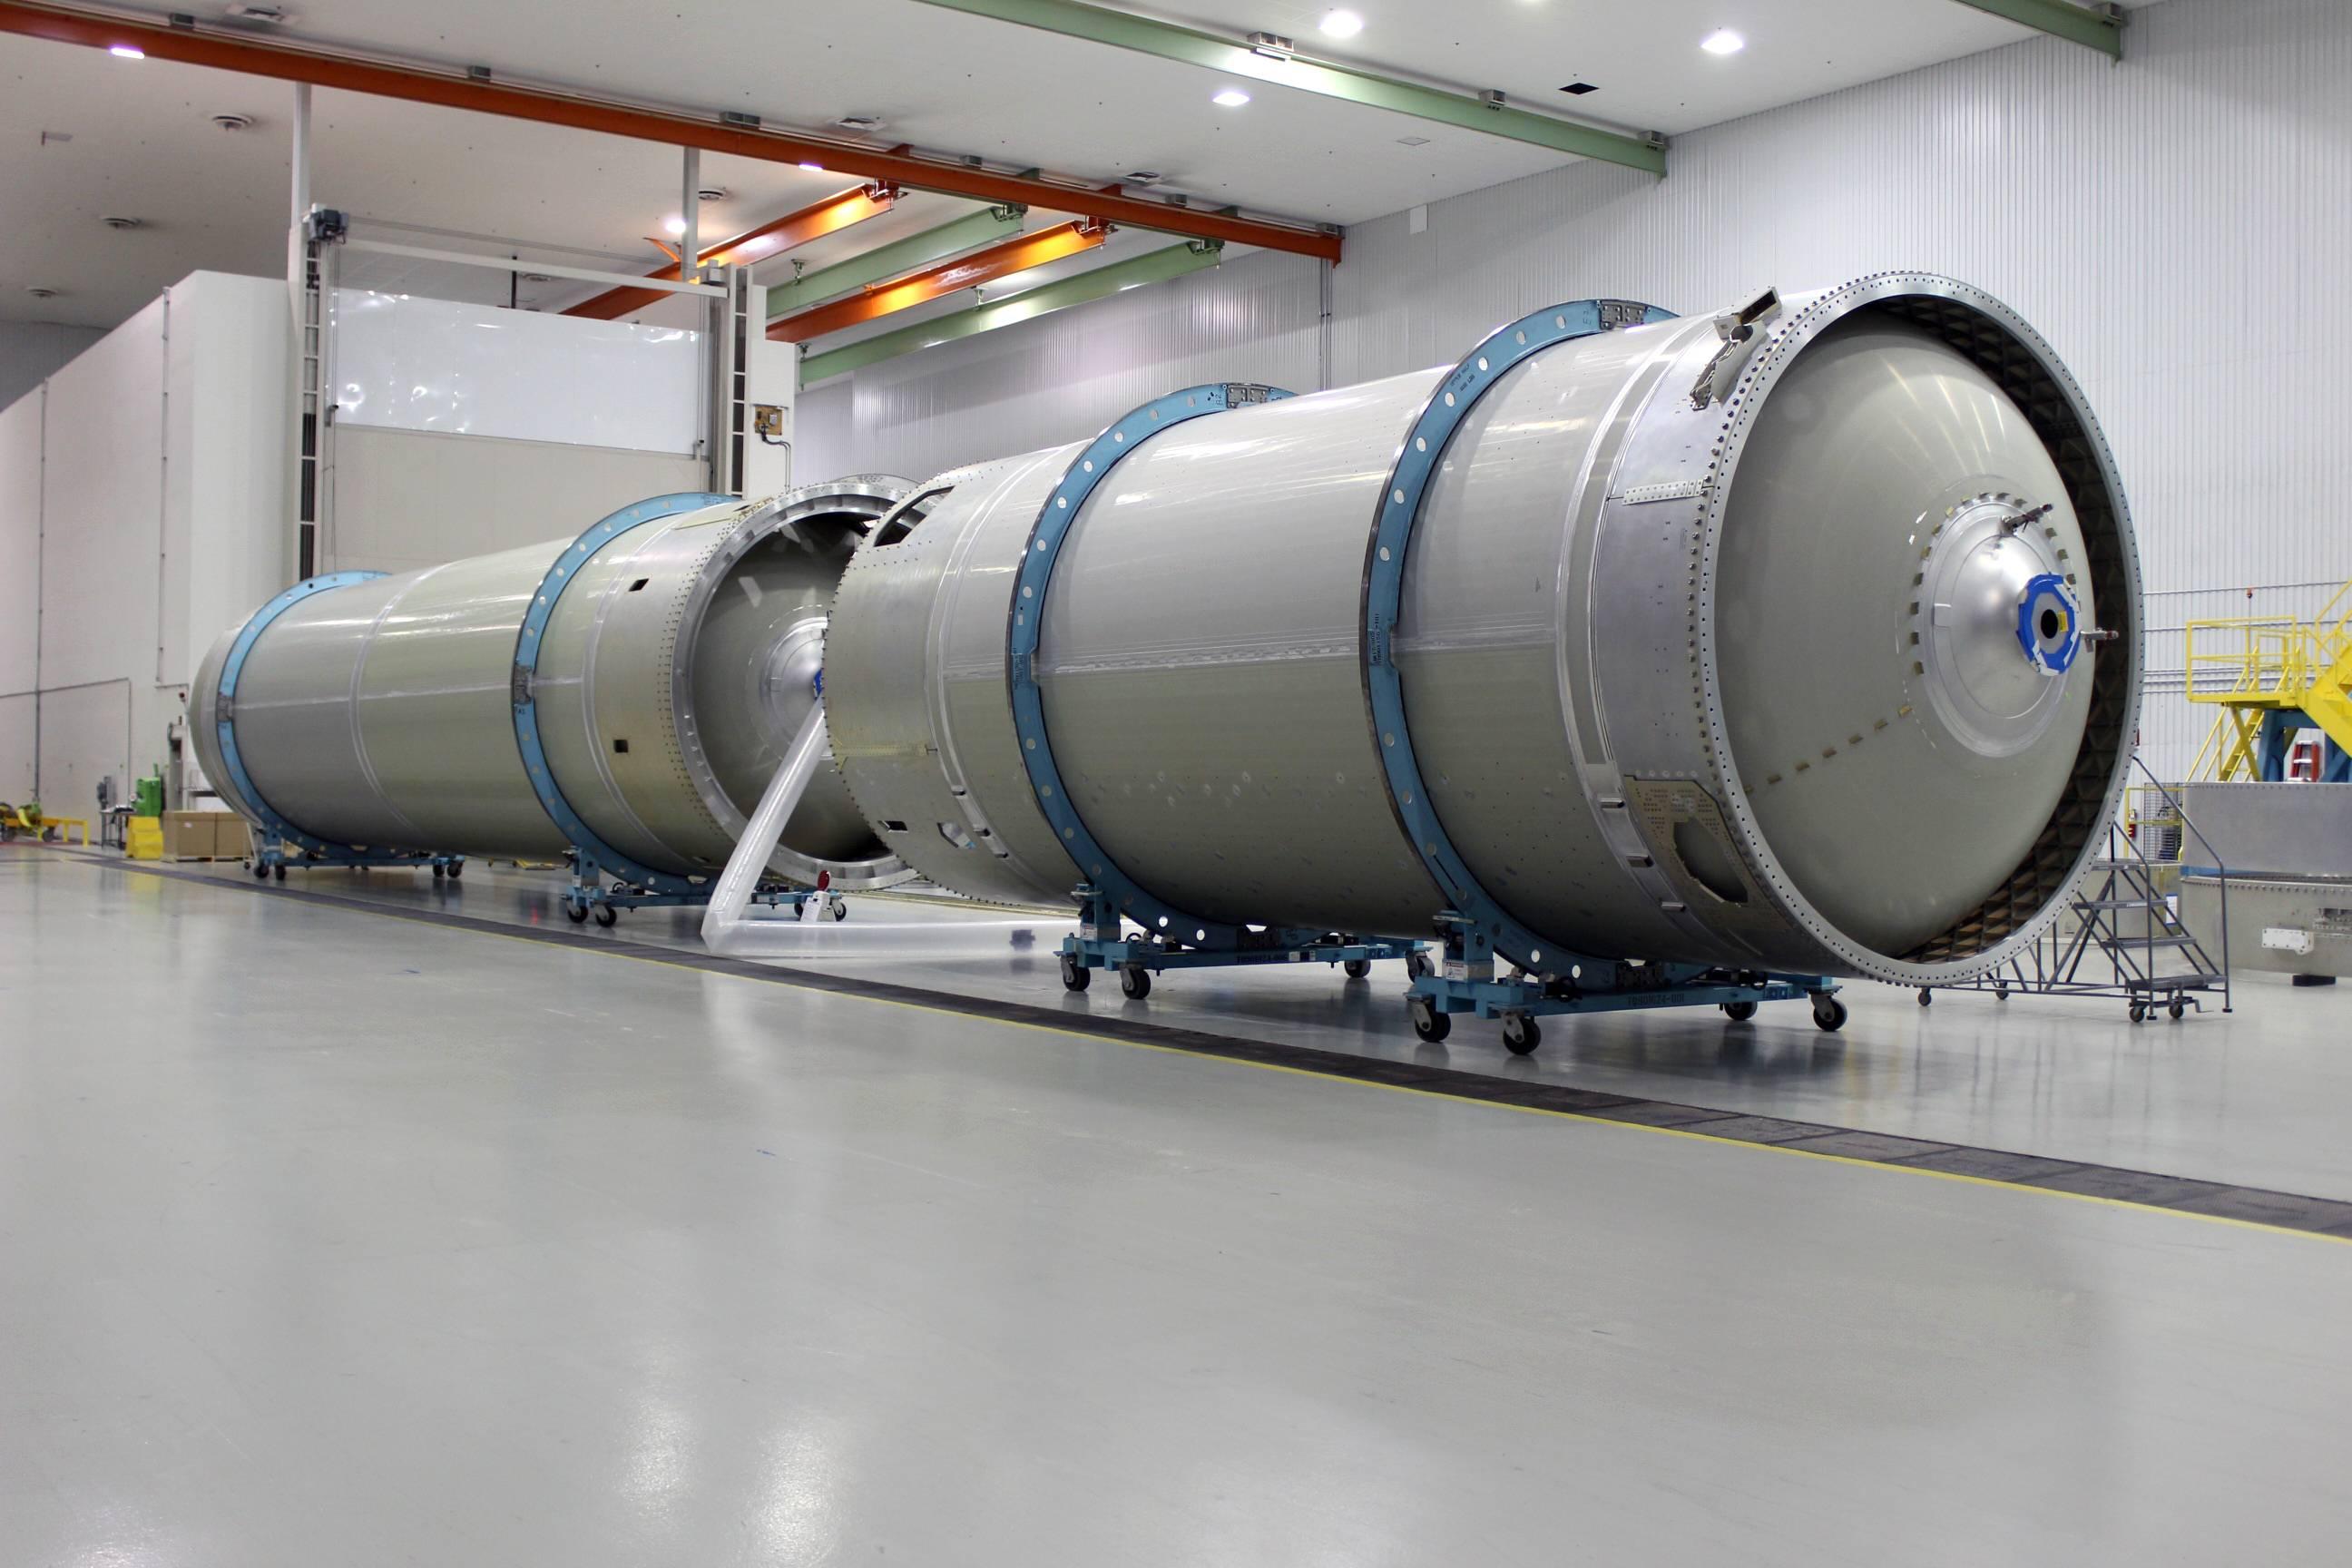 Atlas V core stage prep 092417 (ULA)